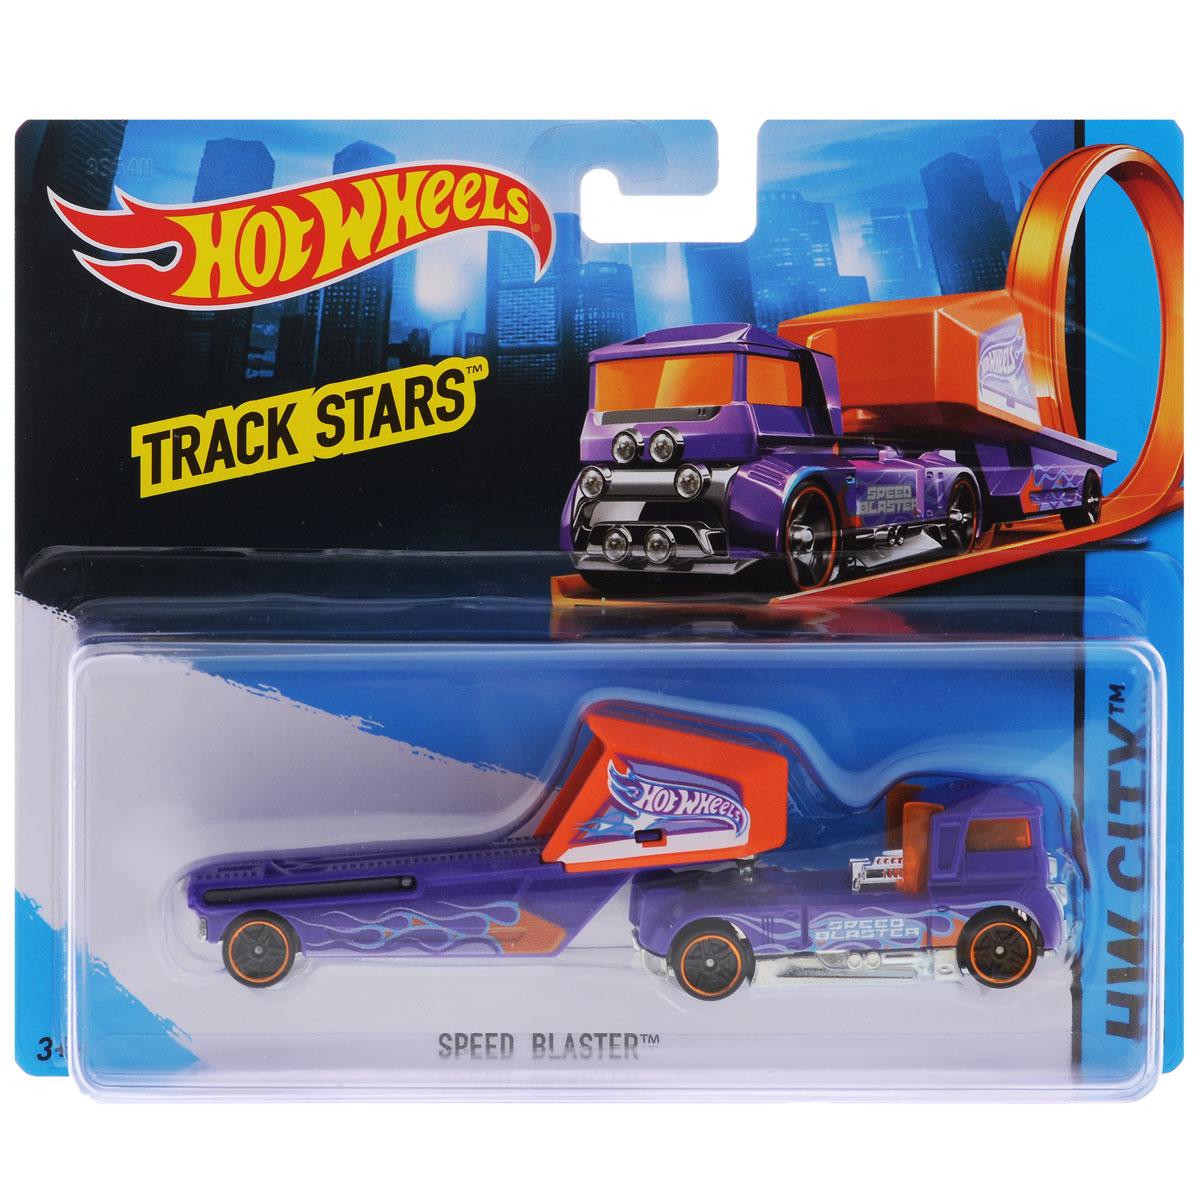 Hot Wheels Track Stars Трейлер Speed Blaster цвет фиолетовый hot wheels track stars трейлер aero blast